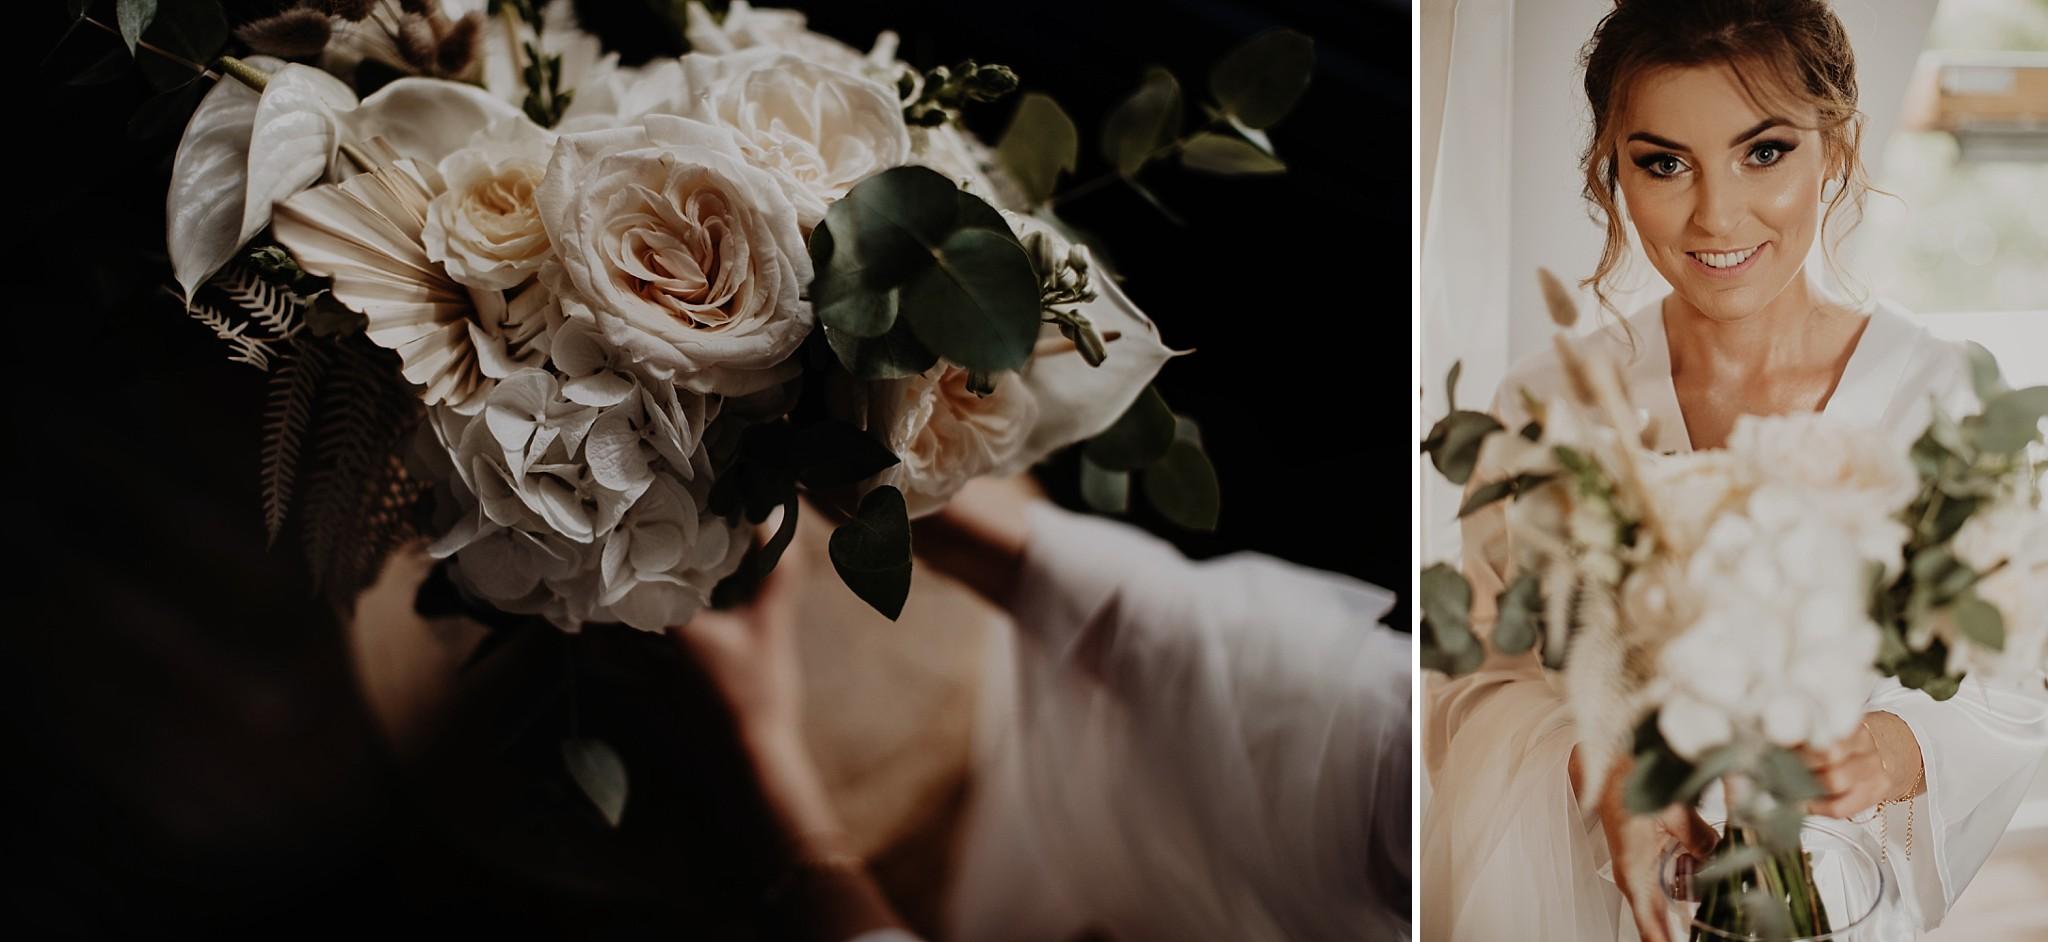 fotograf poznan wesele dobra truskawka piekne wesele pod poznaniem wesele w dobrej truskawce piekna para mloda slub marzen slub koronawirus slub listopad wesele koronawirus 037